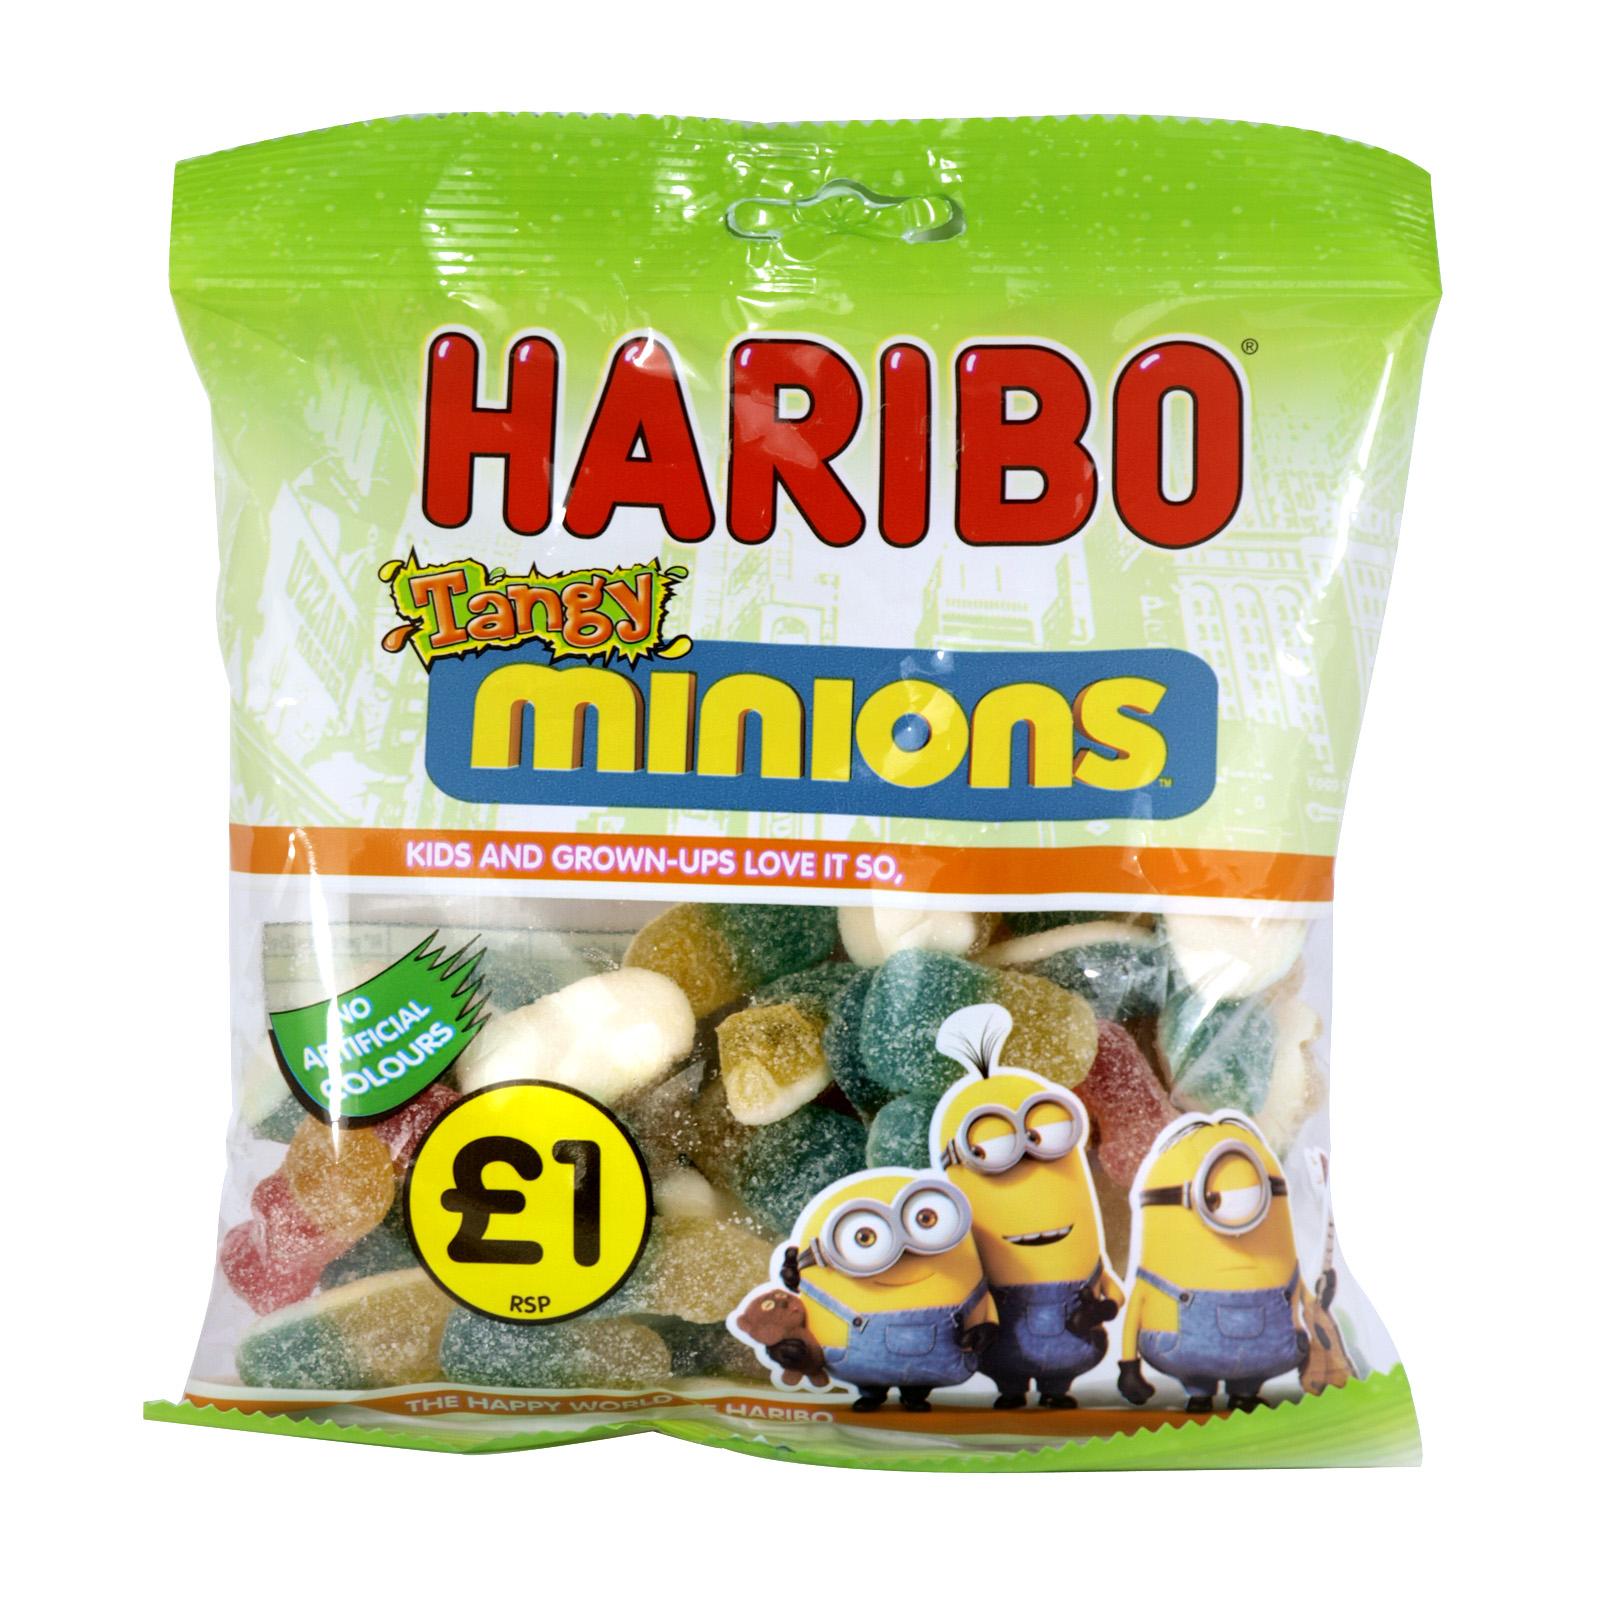 HARIBO 140GM BAGS MINIONS X14